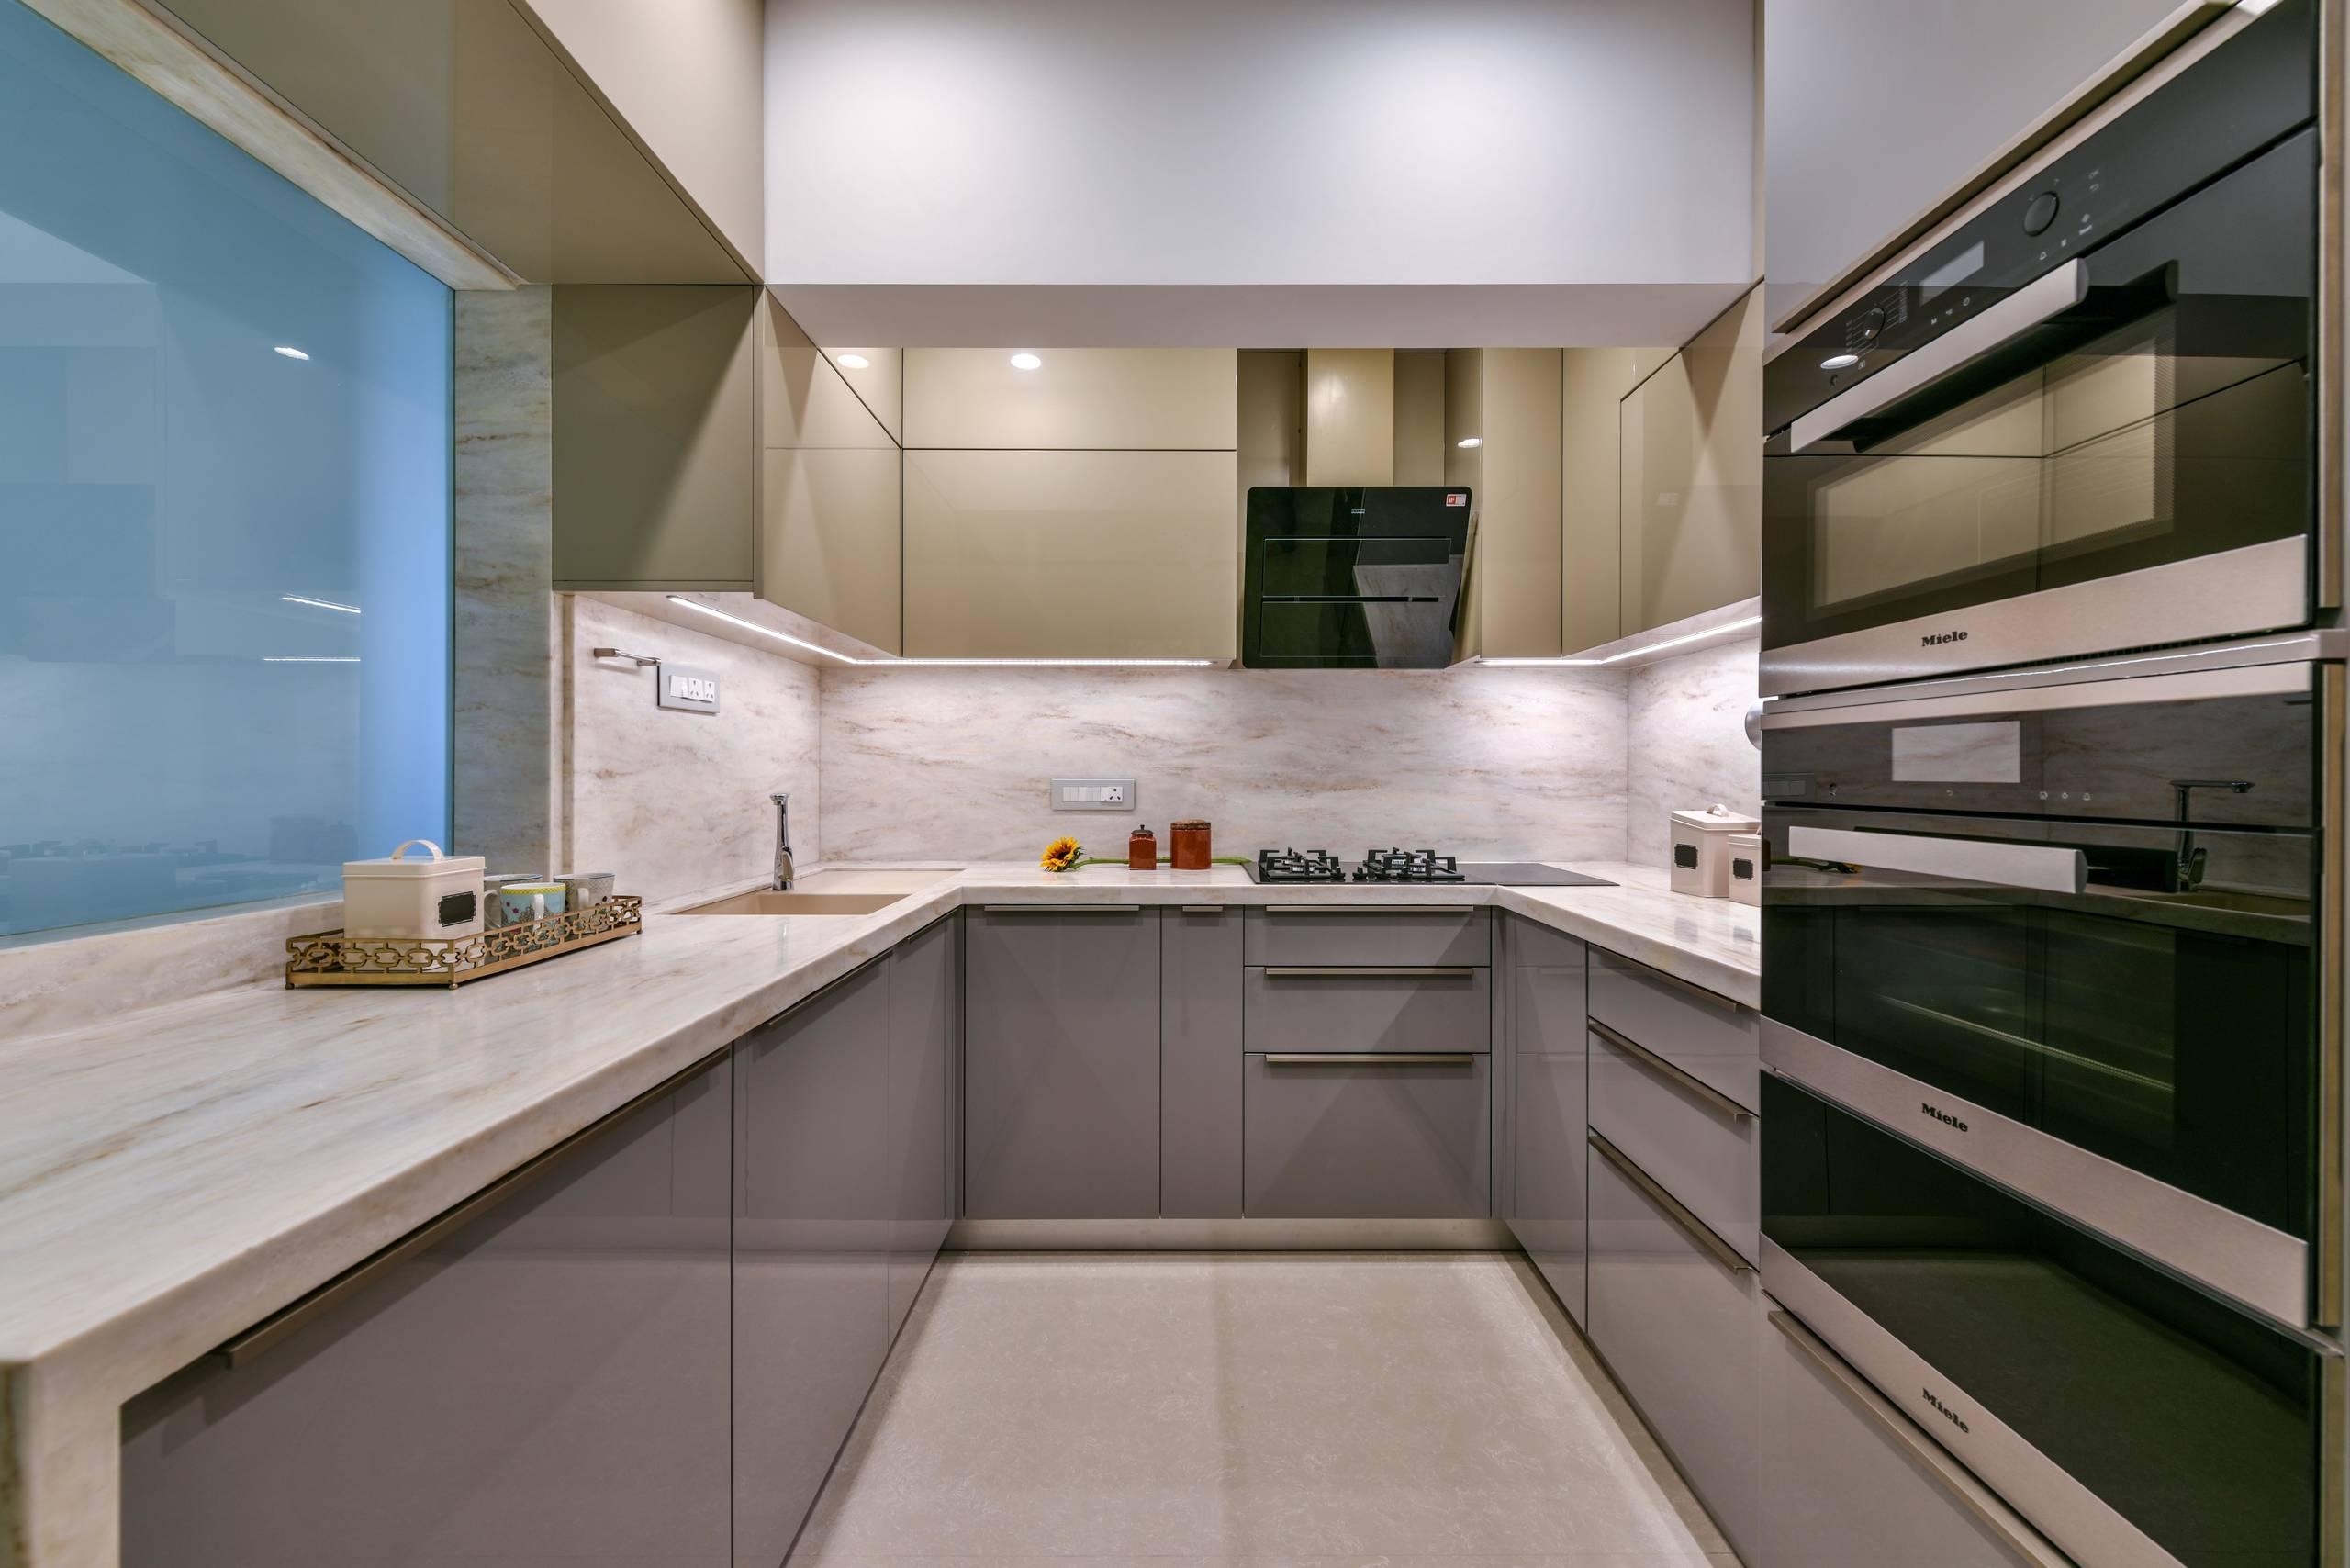 75 Beautiful Asian Kitchen With Beige Backsplash Pictures Ideas November 2020 Houzz